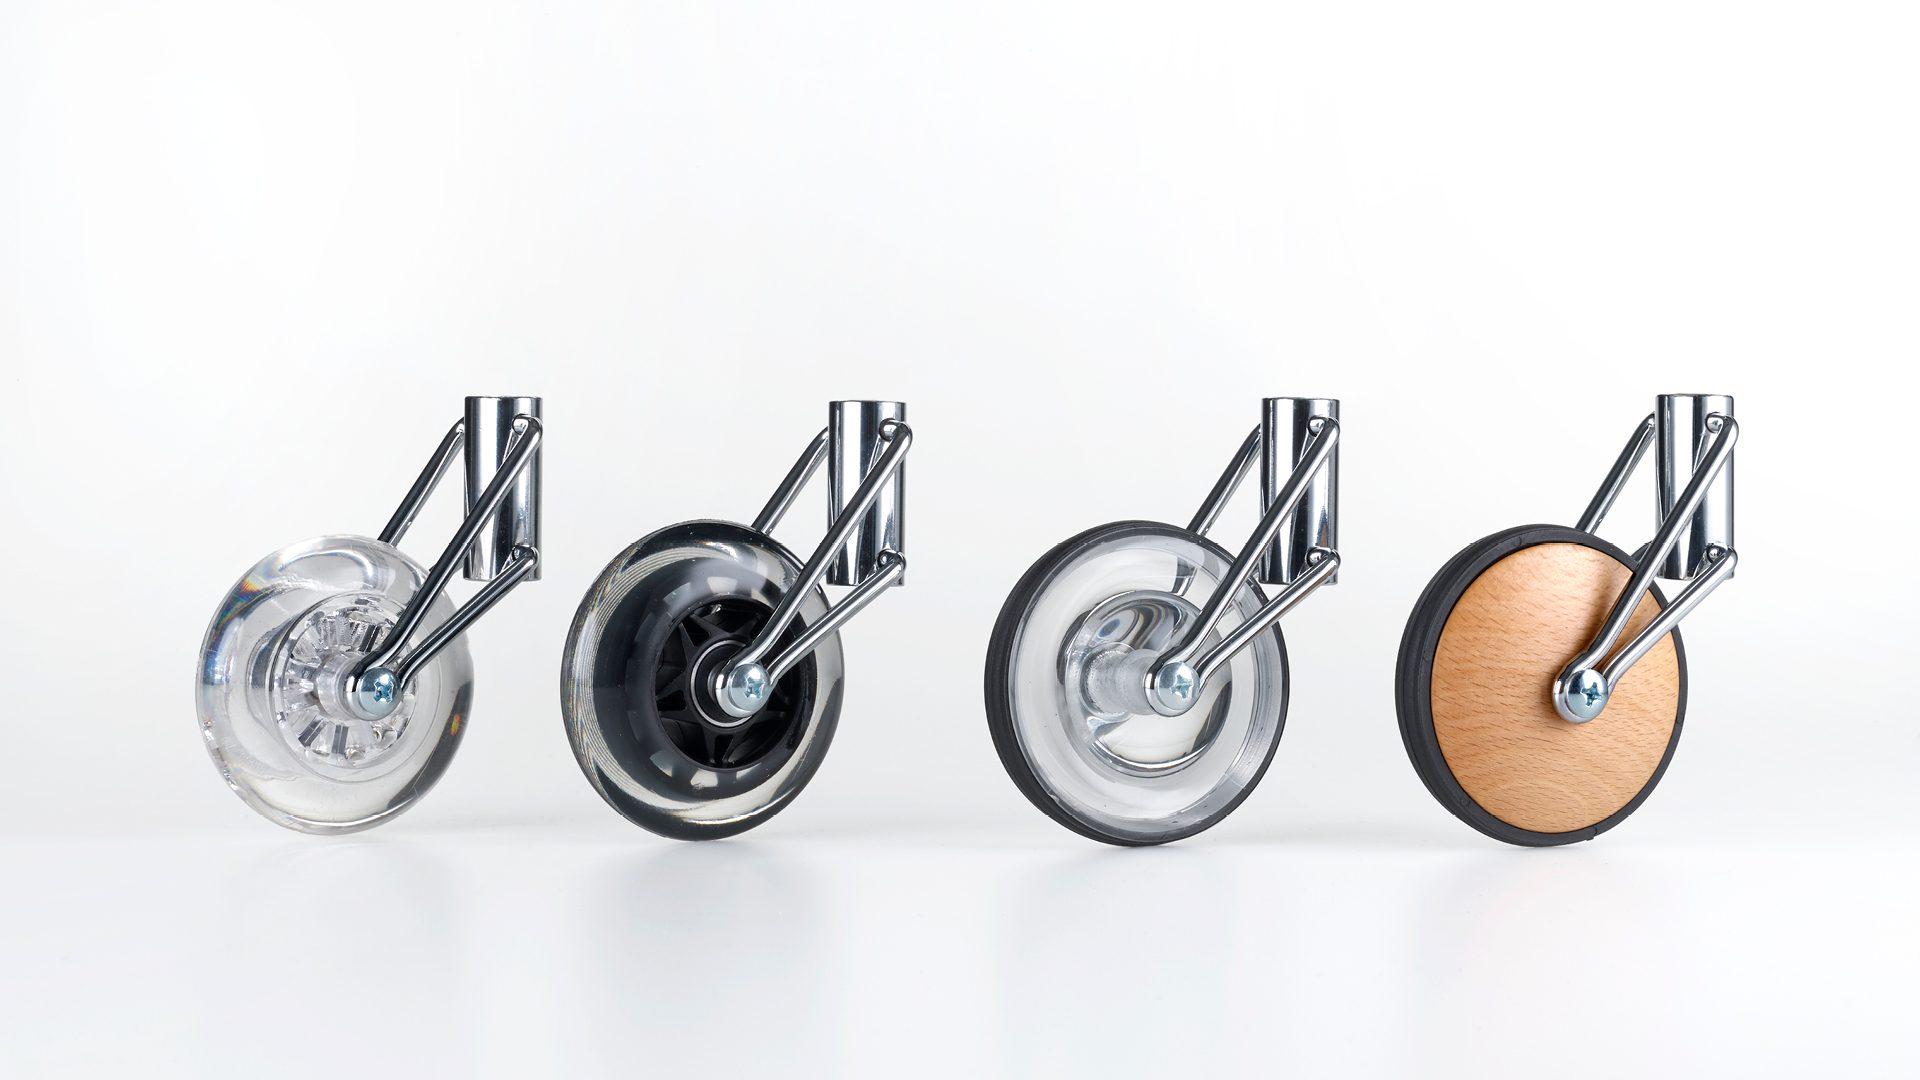 Cycle - Sarmetal